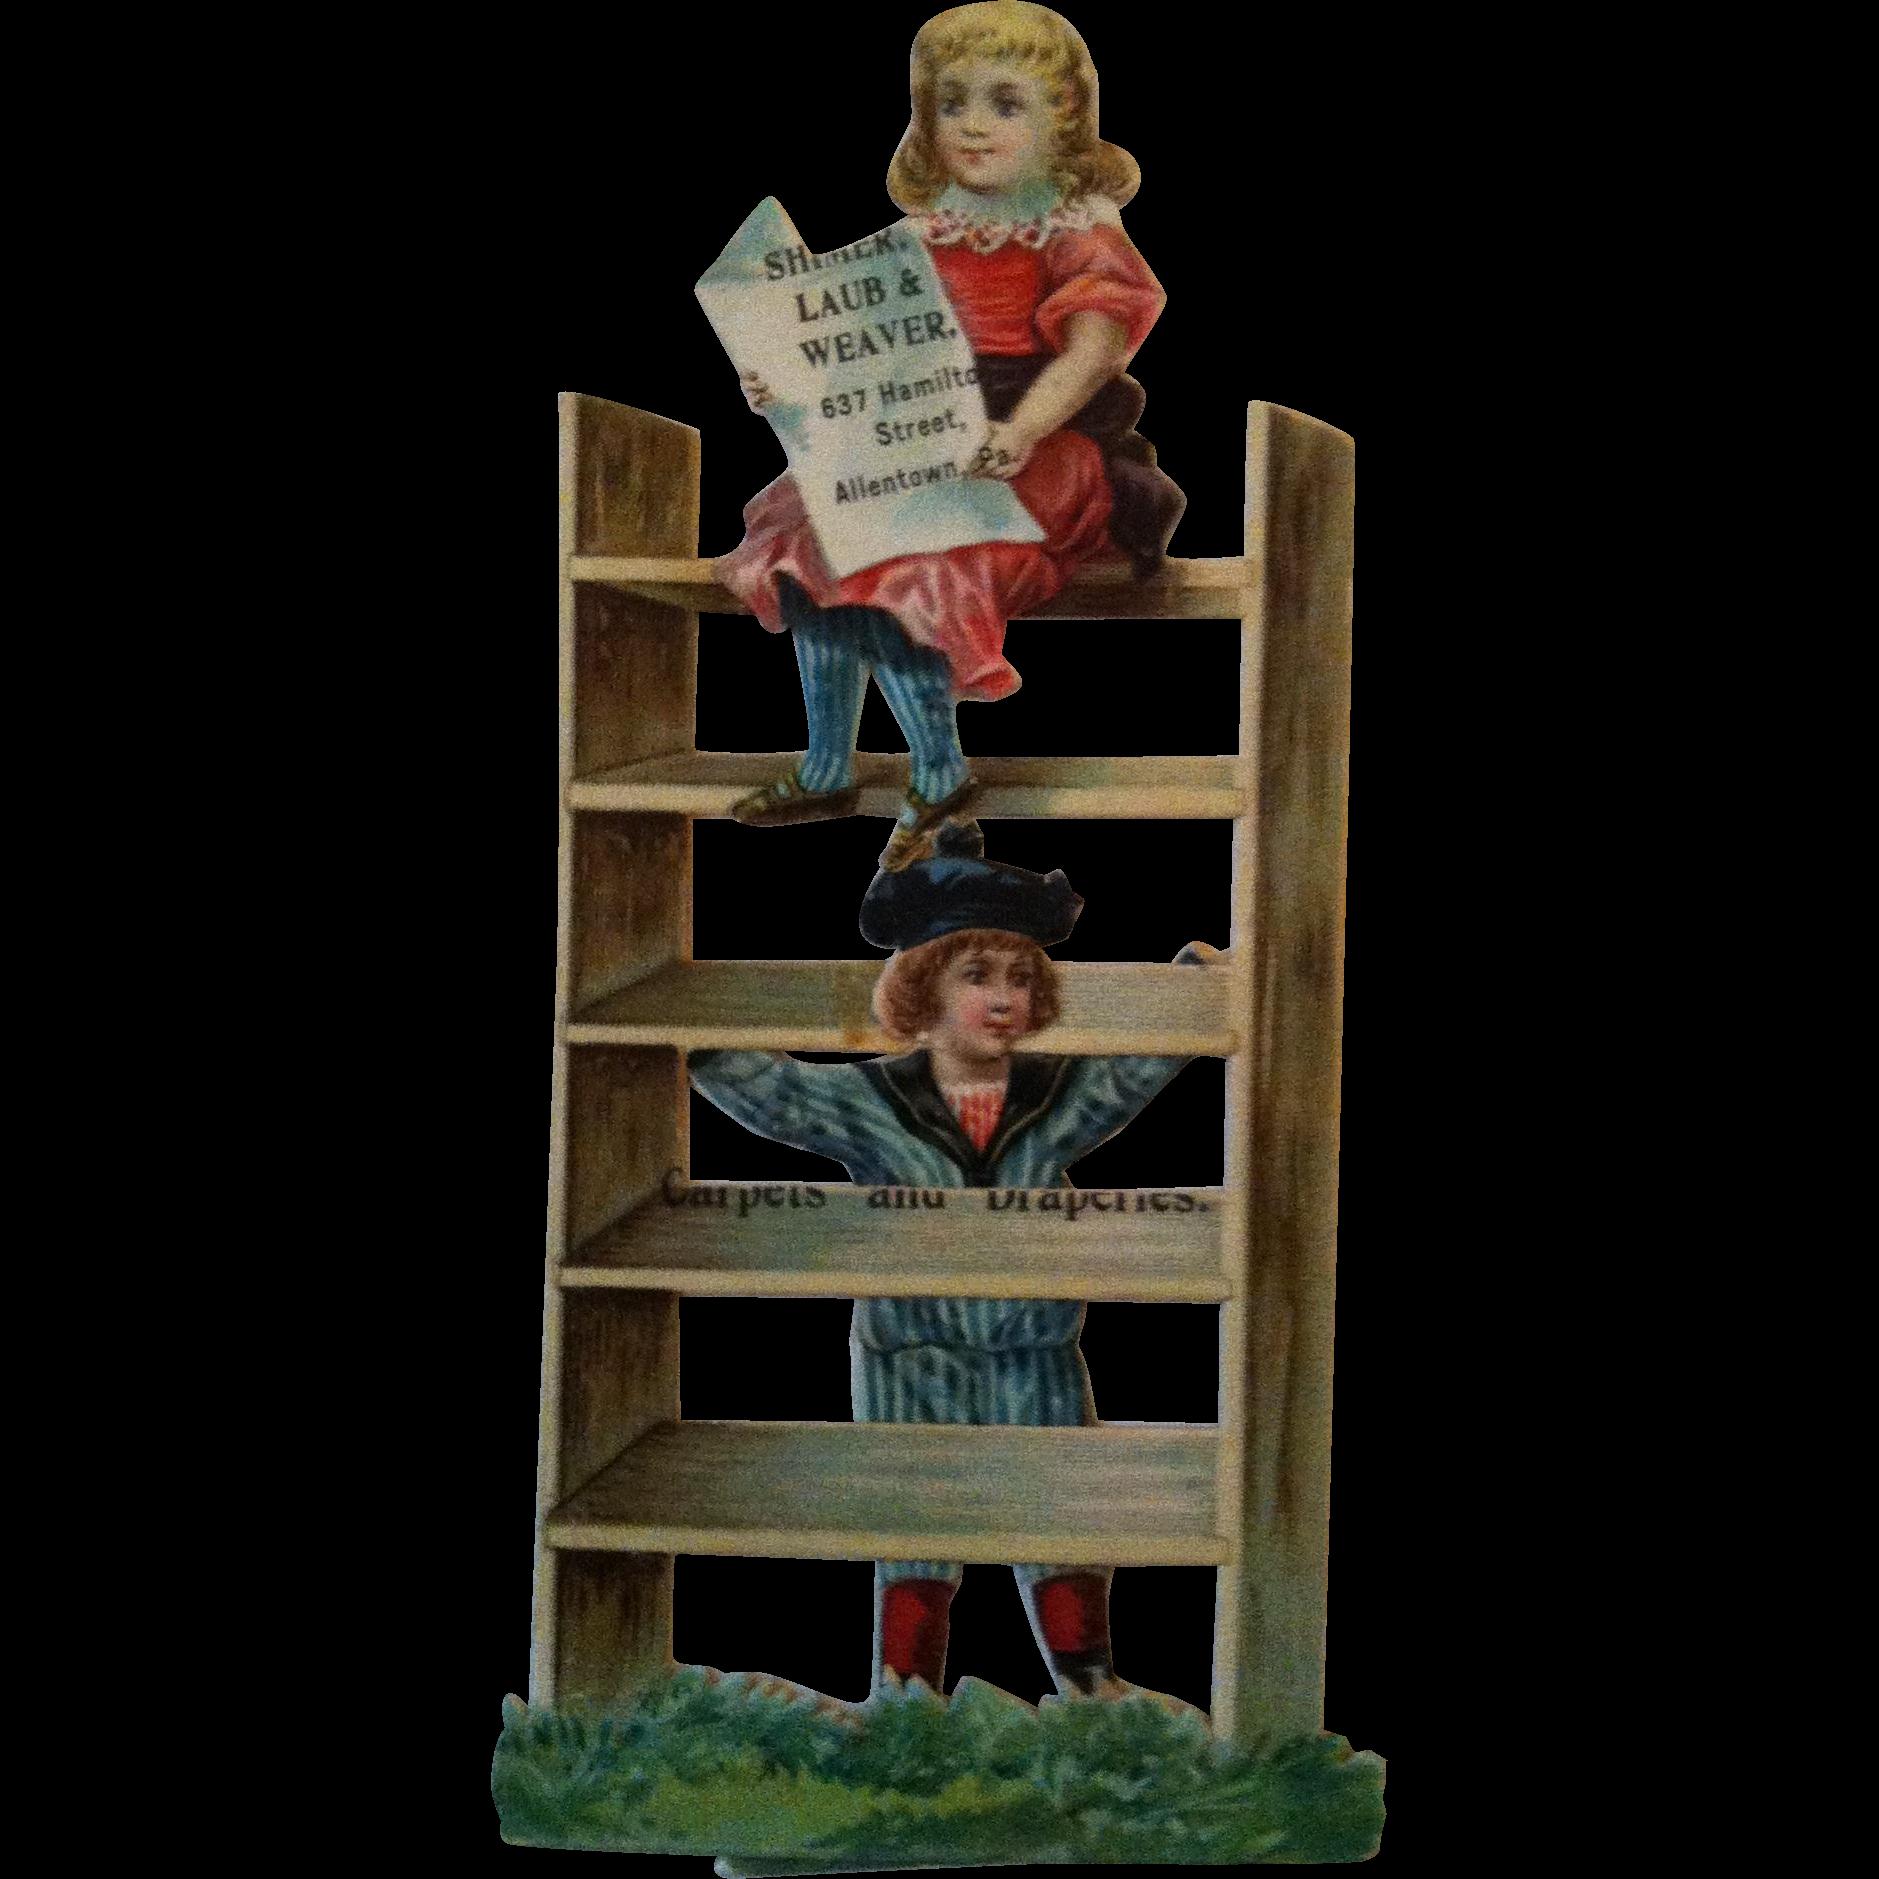 Shimer, Laub & Weaver Carpets & Drapes- Allentown Pa Advertising Trade Card